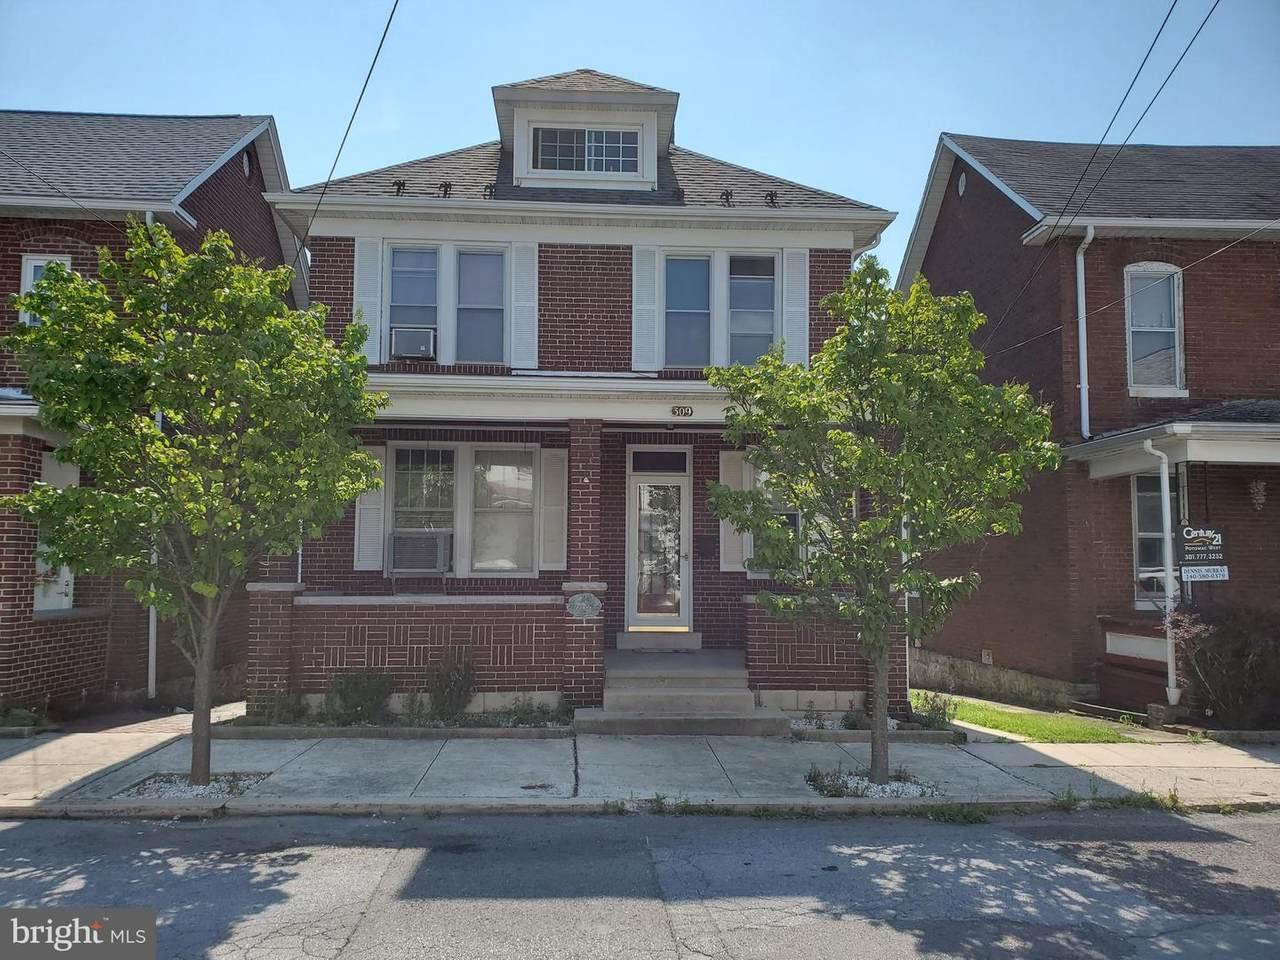 309 Pulaski Street - Photo 1